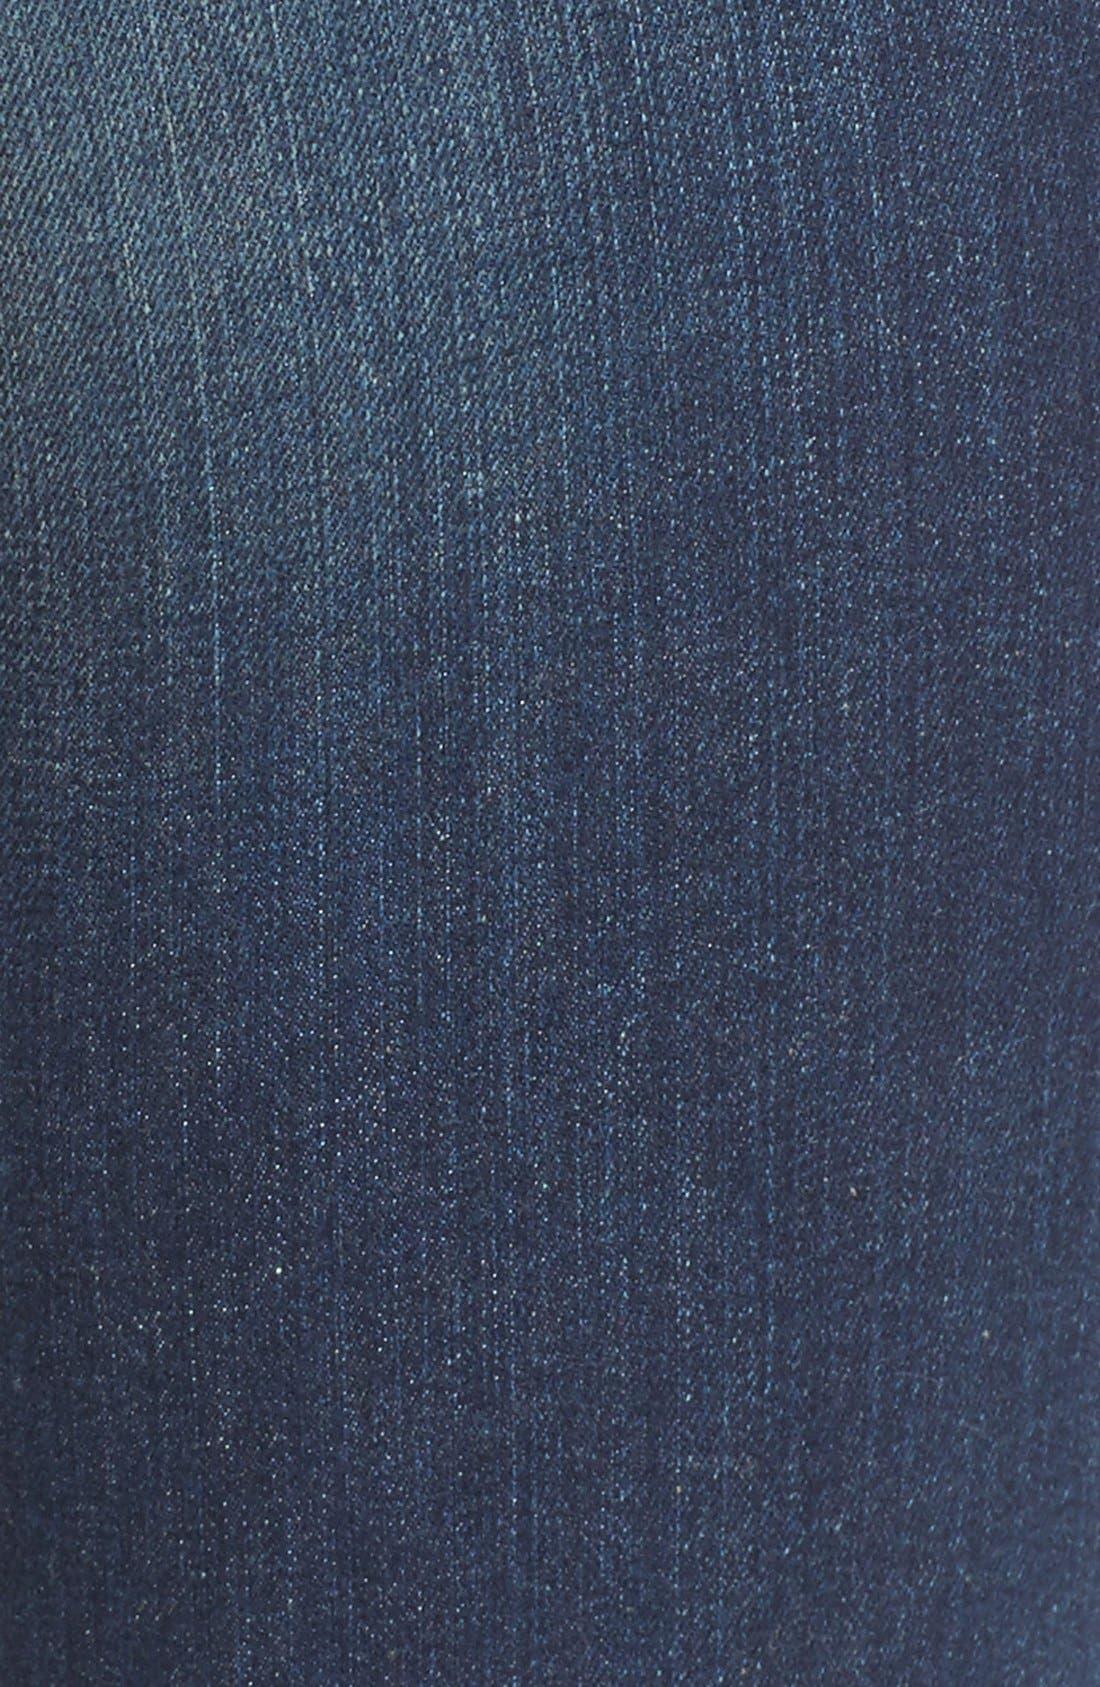 Alternate Image 5  - Kut from the Kloth 'Catherine' Slim Boyfriend Jeans (Carefulness) (Regular & Petite)